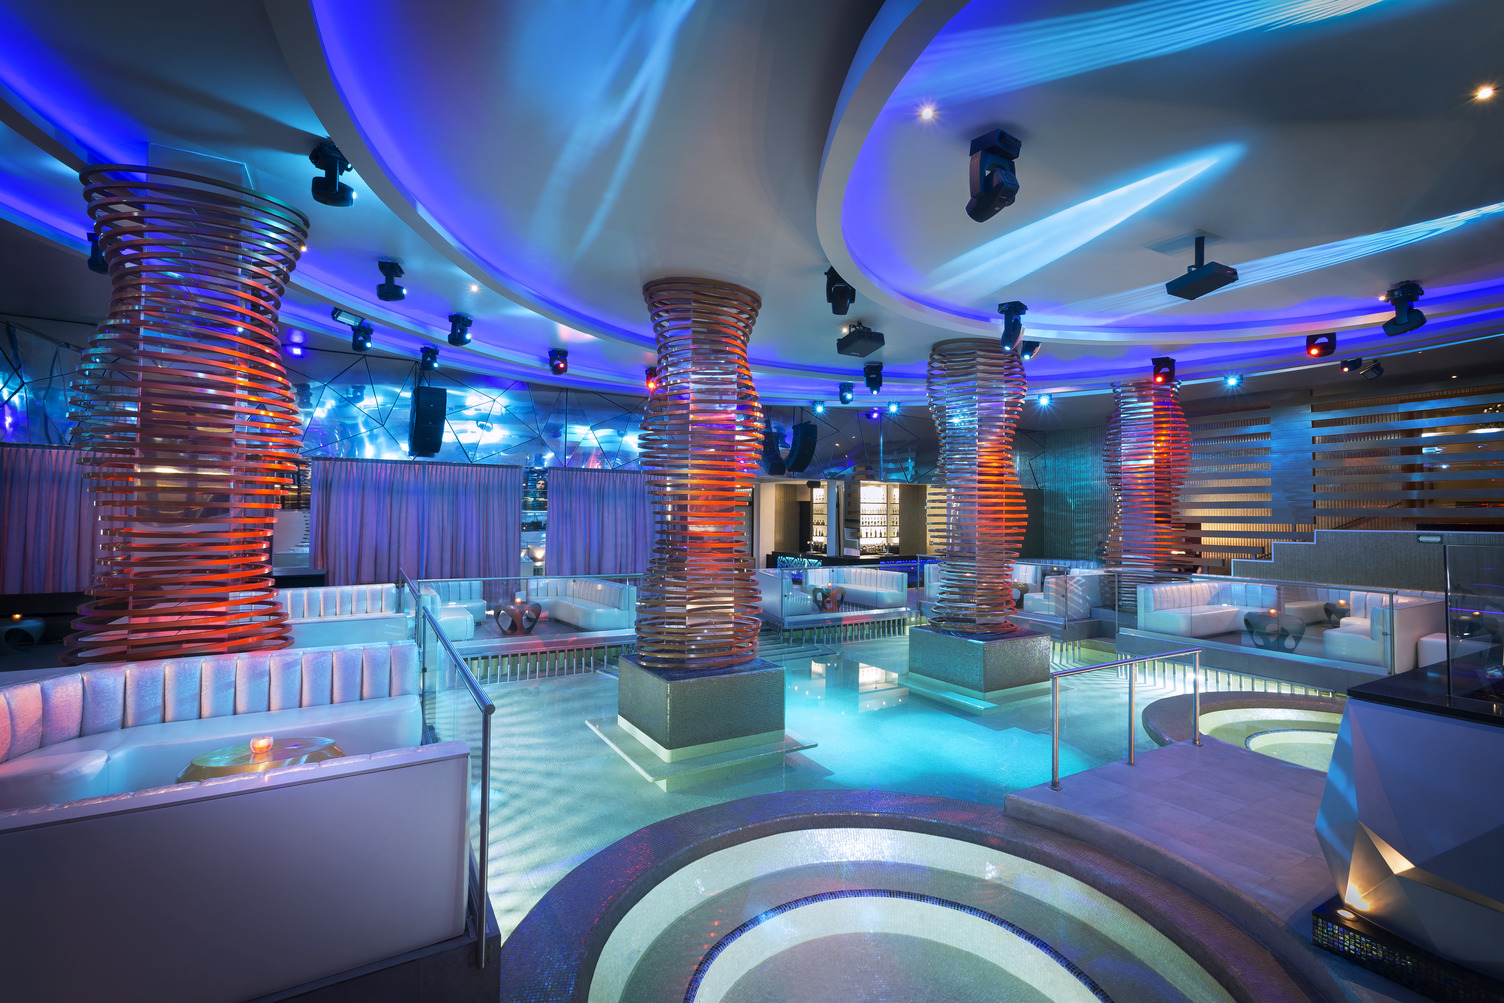 Travel Agency All-Inclusive Resort Heaven at Hard Rock Hotel Riviera Maya 51